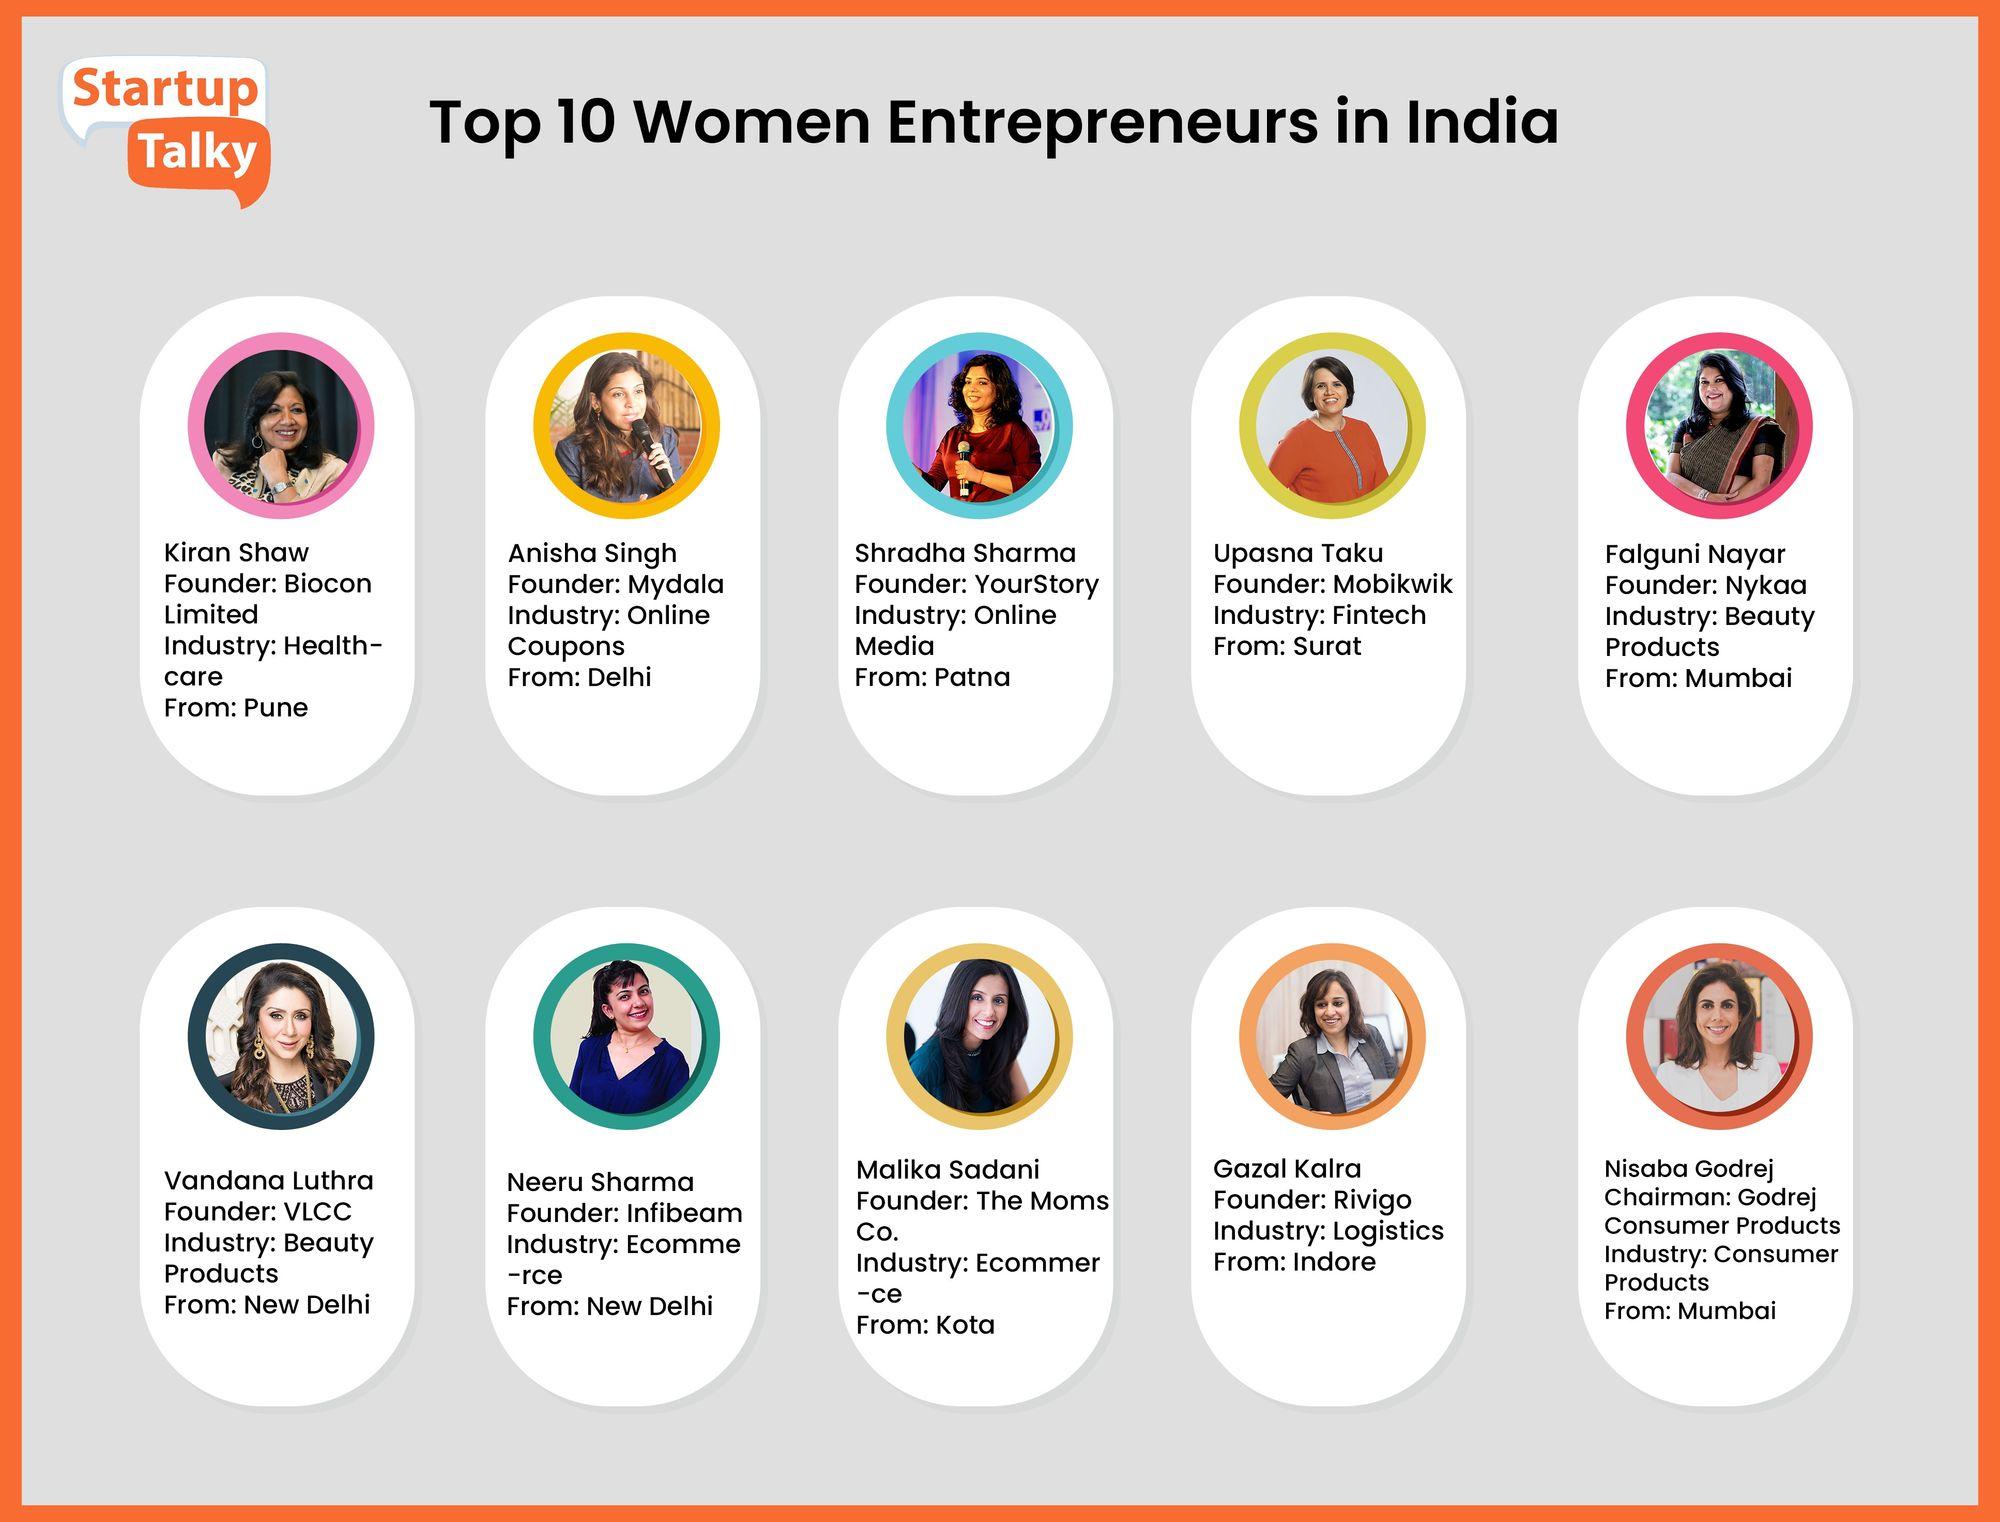 Top 10 Women Entrepreneurs 2021